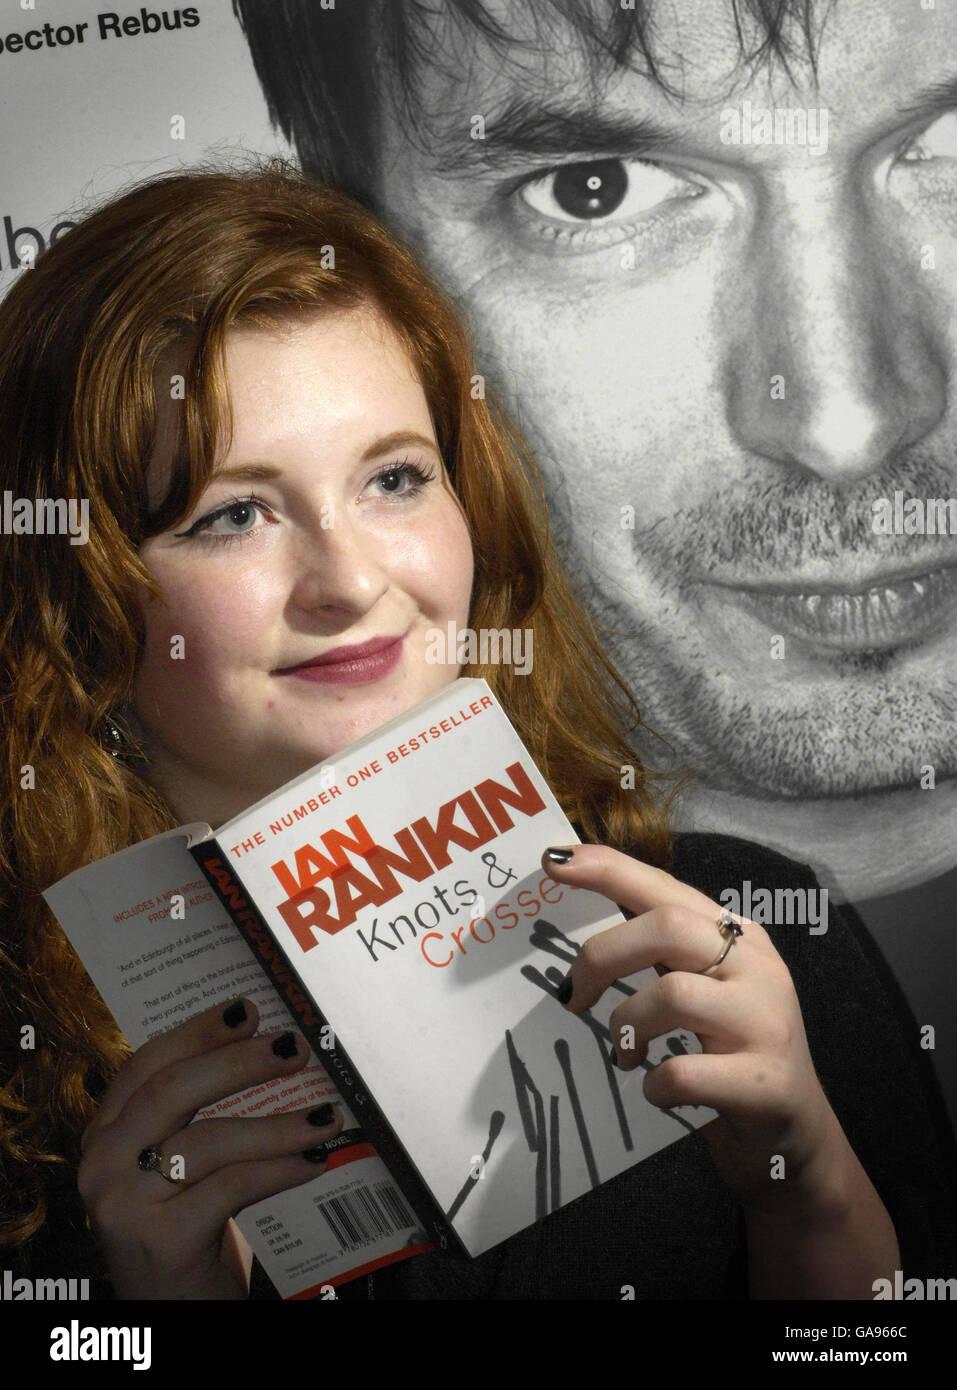 Ian Rankin's first Rebus novel revealed - Stock Image